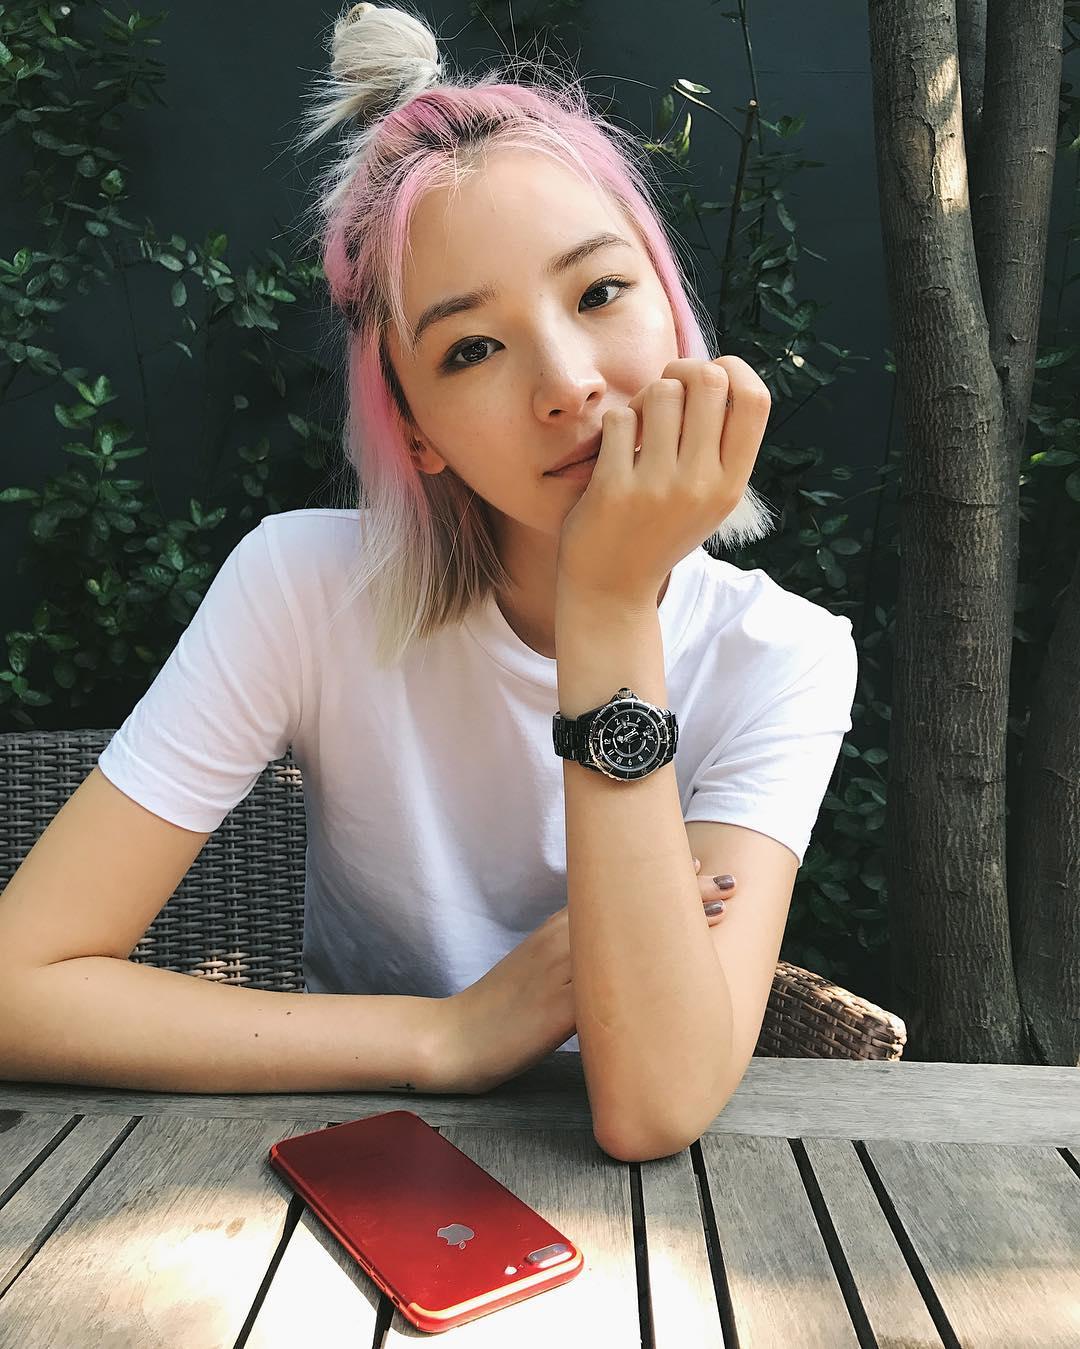 Irene Kim Instagram username